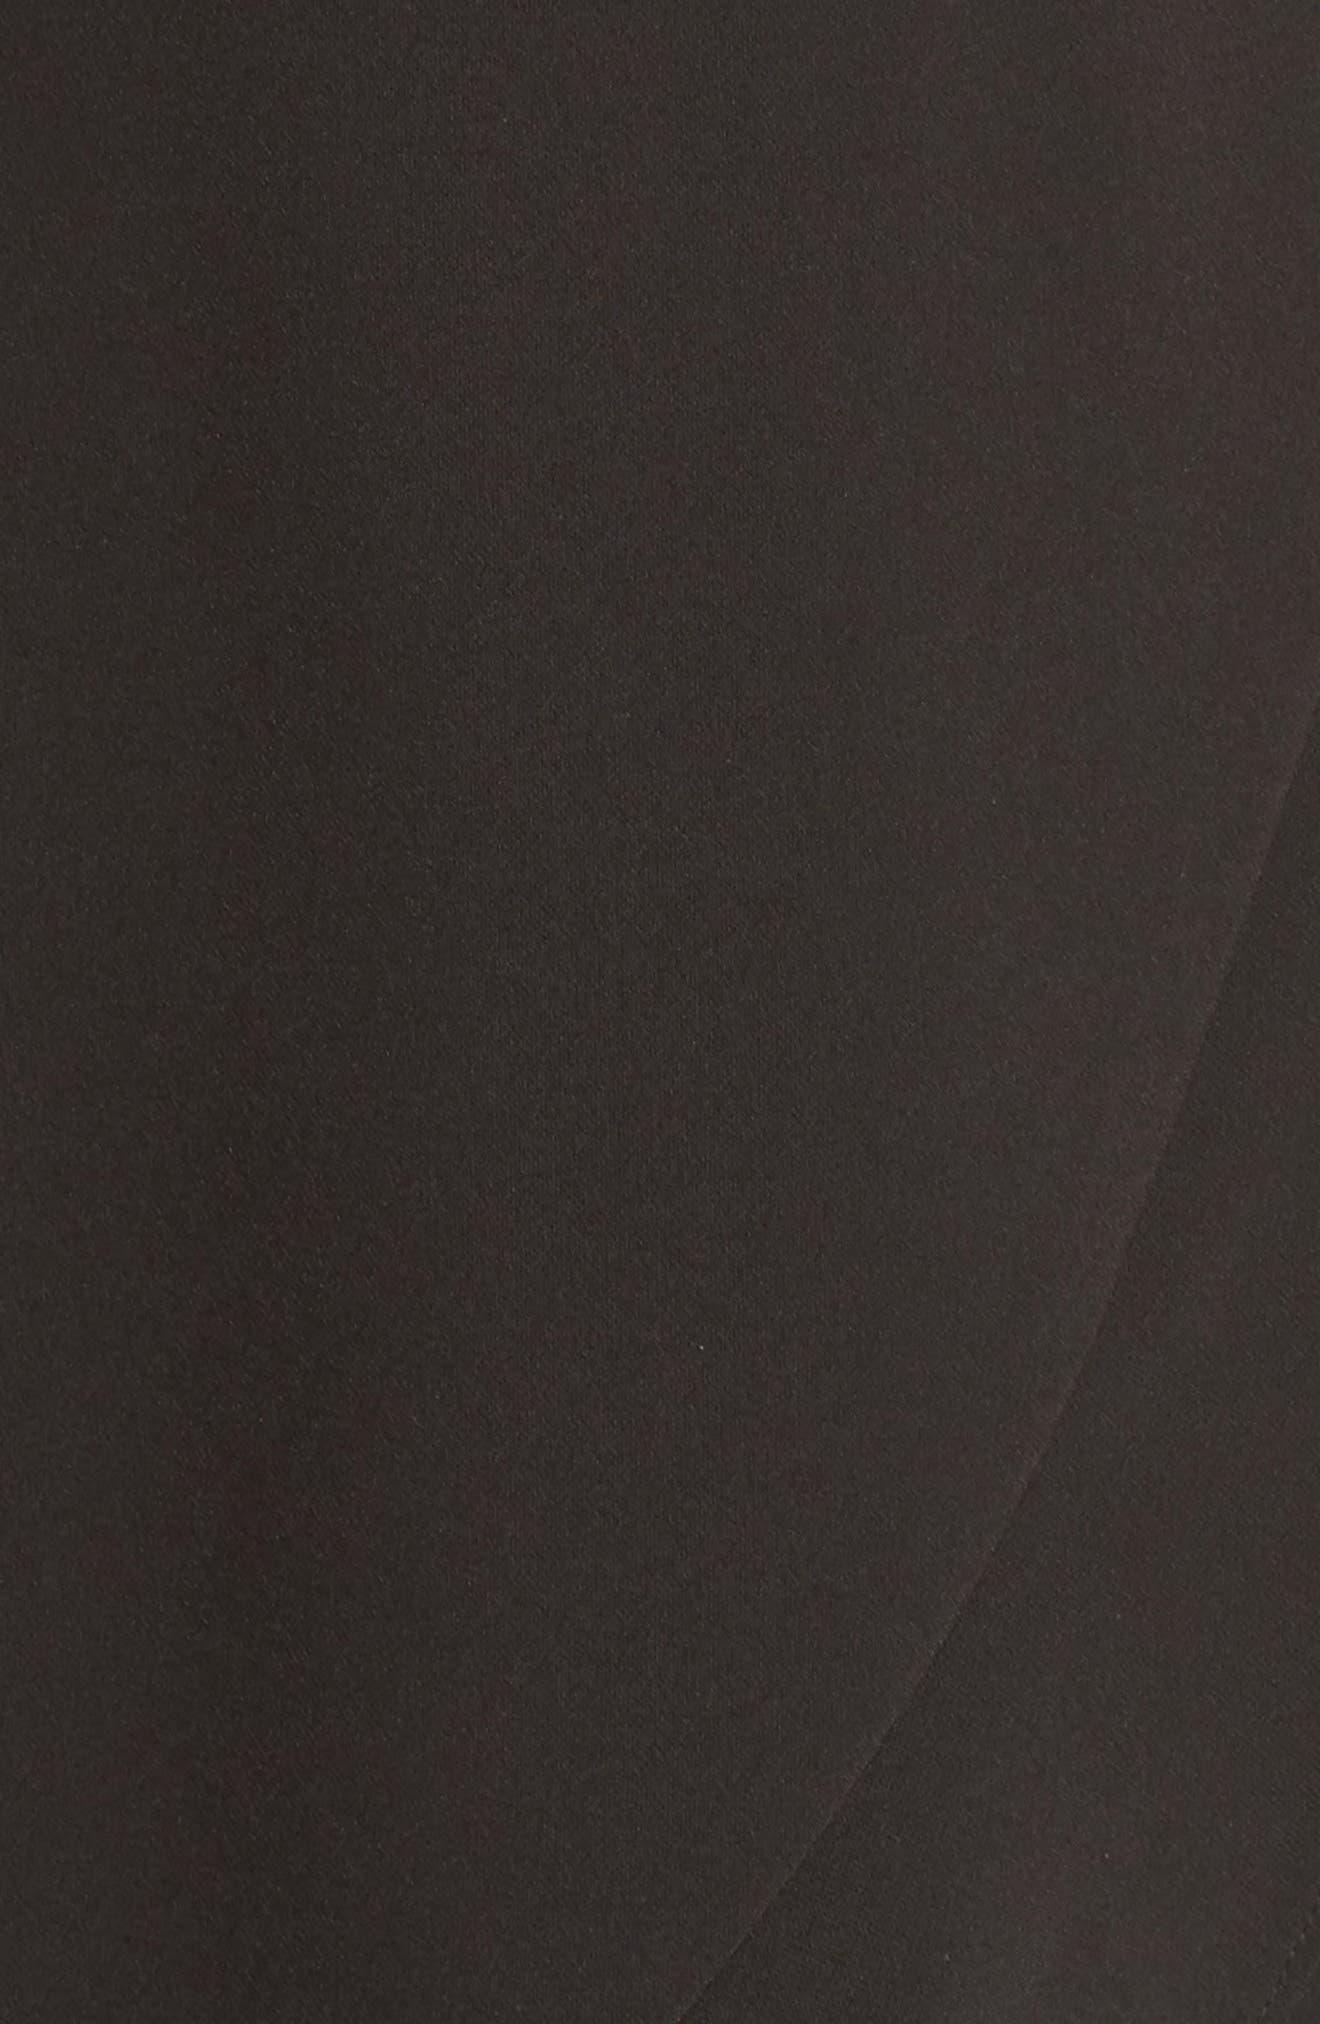 Cold Shoulder Ruffle Sheath Dress,                             Alternate thumbnail 6, color,                             Black